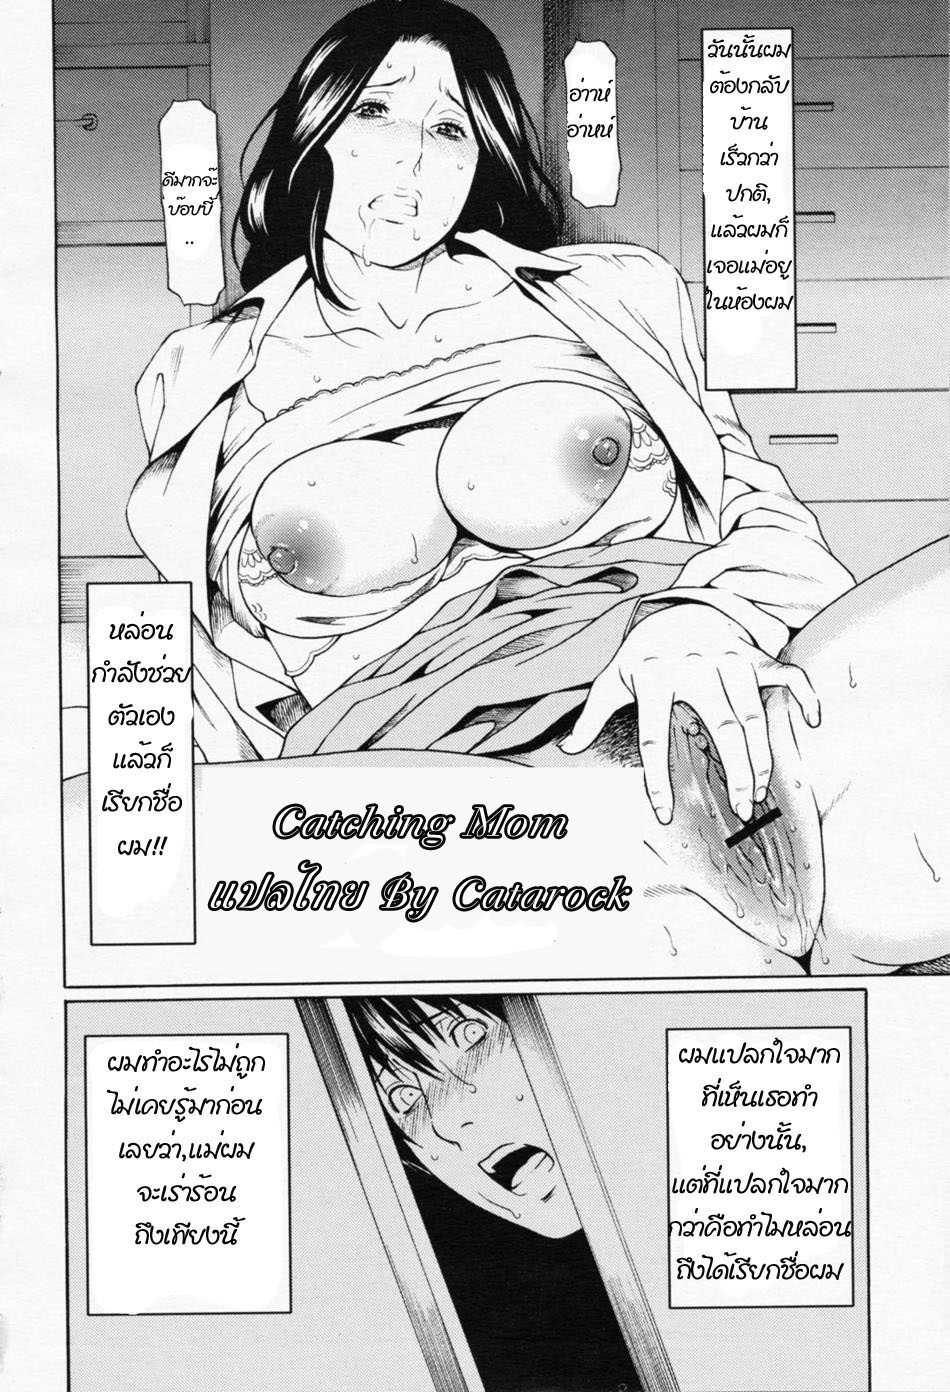 takasugi-kou-catching-mom